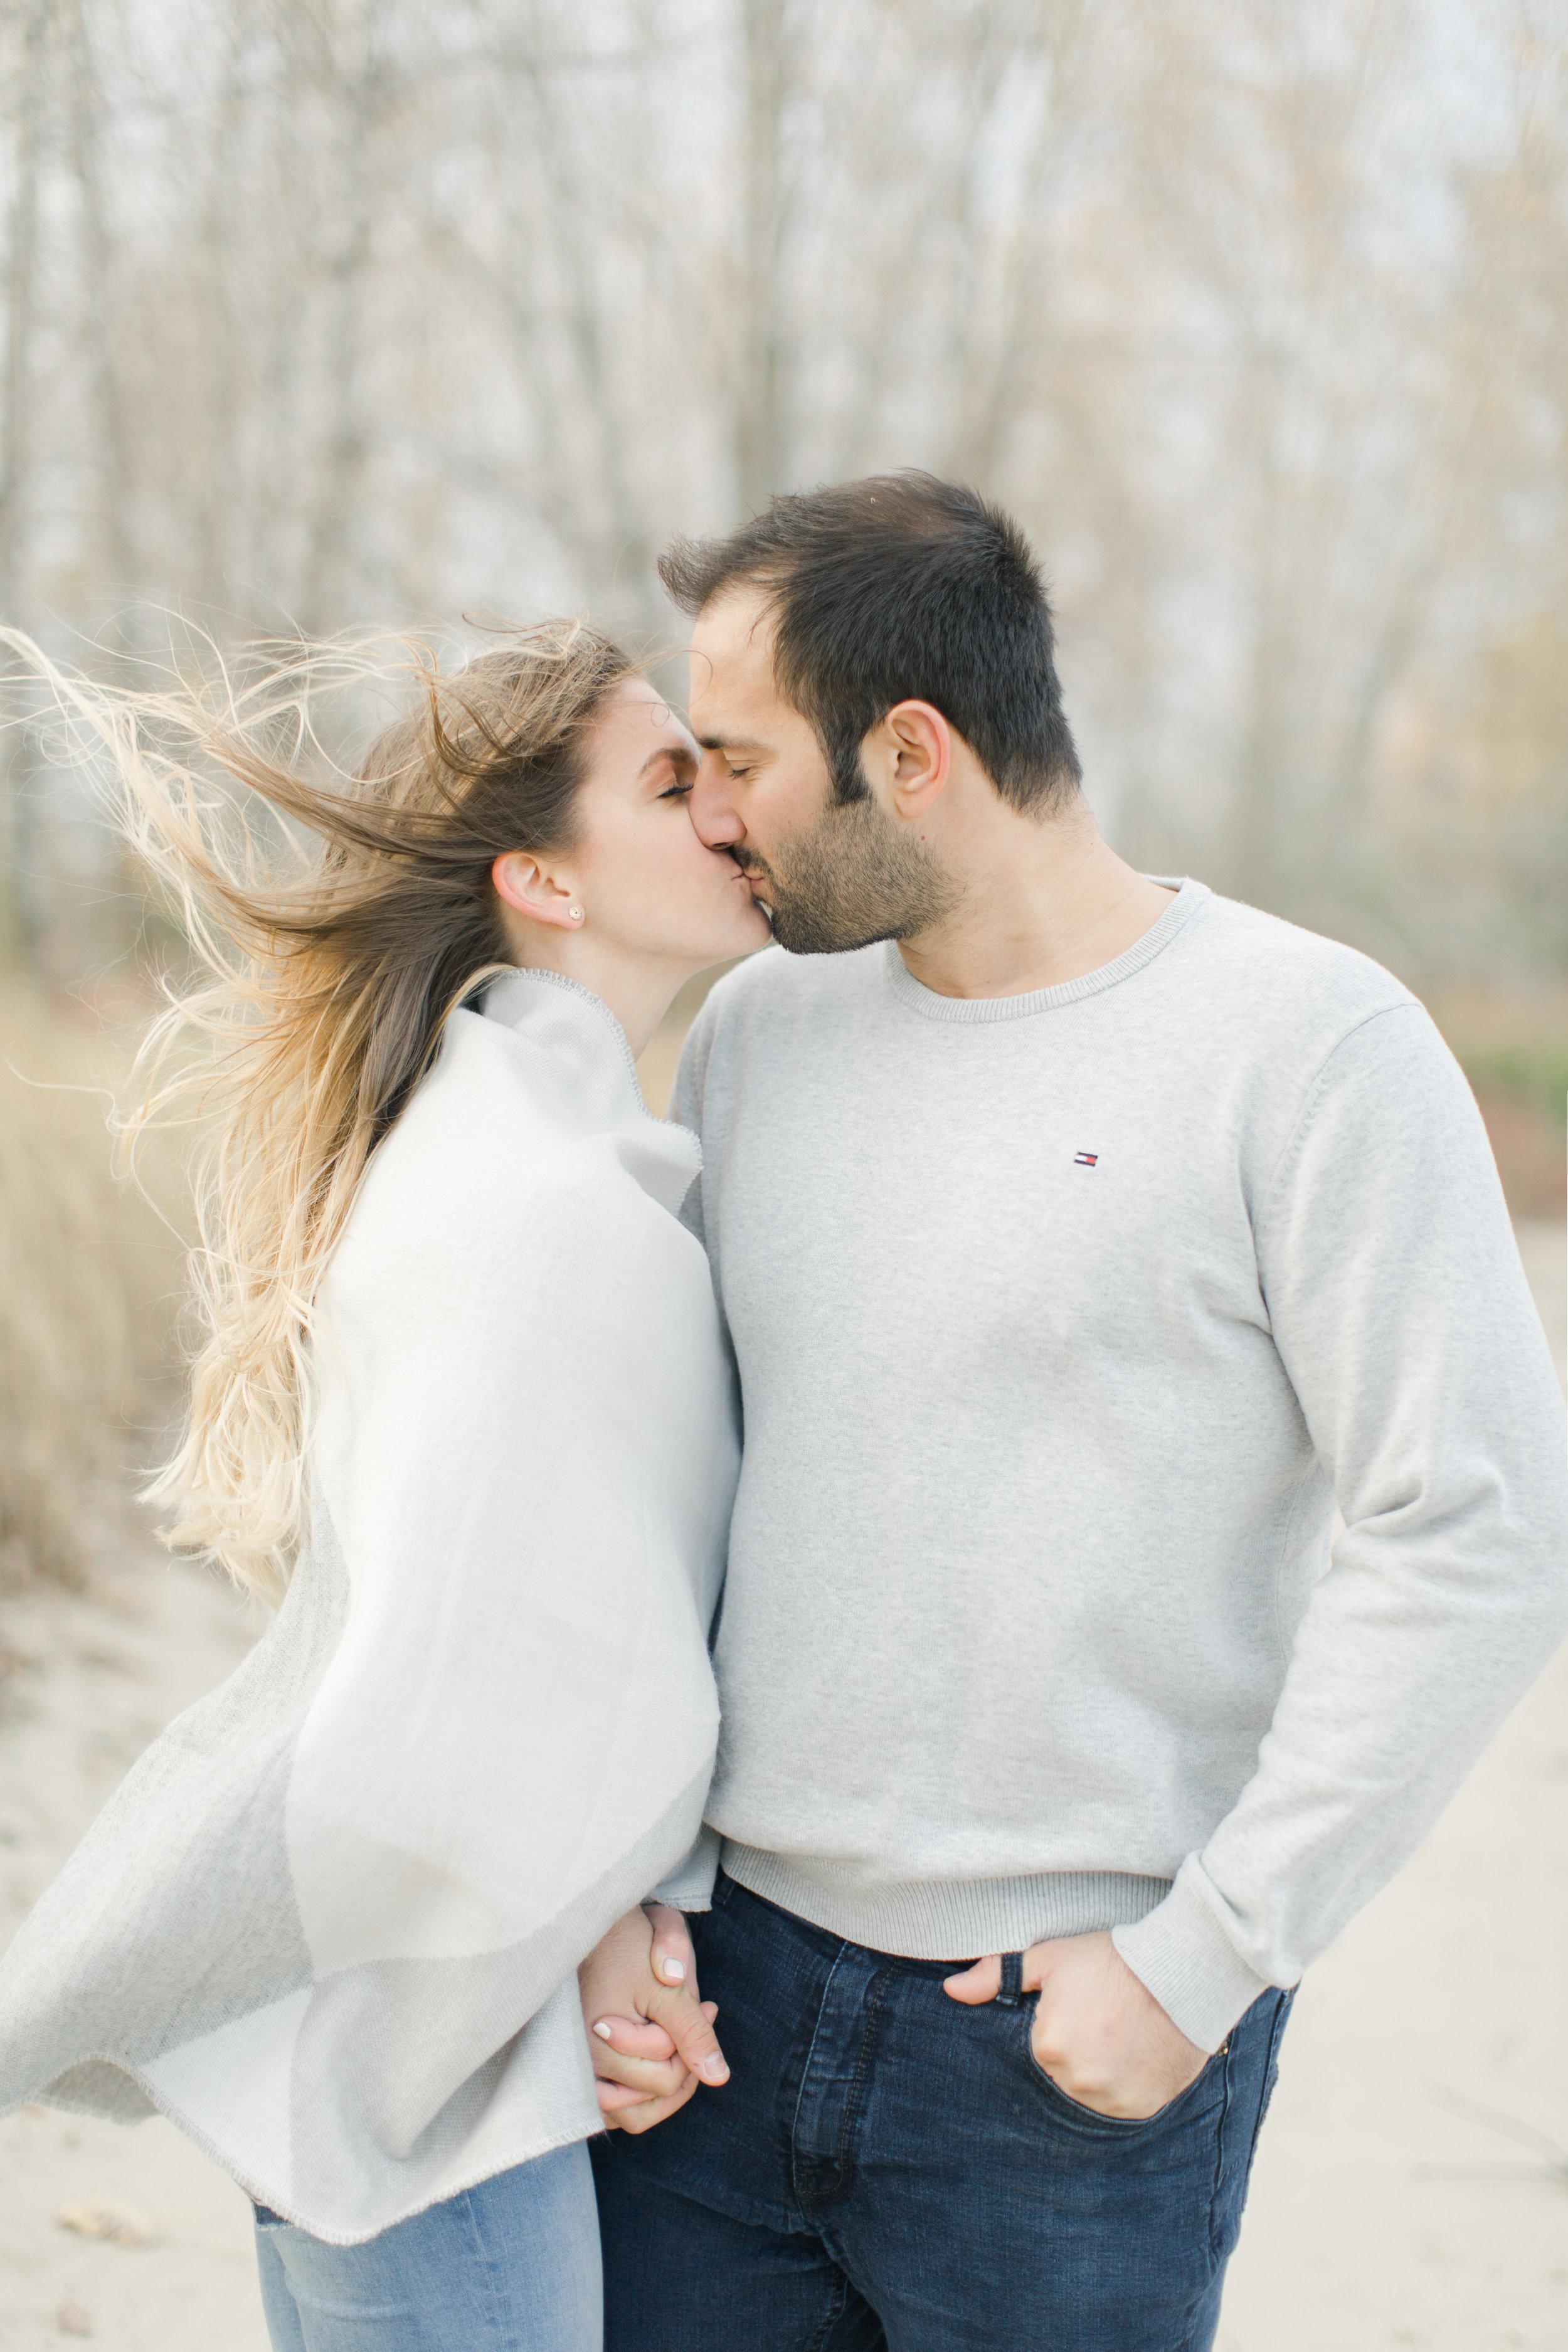 ashbridges-bay-toronto-wedding-photographer-soft-bright-pretty-pastel-richelle-hunter-lauren-miller-heather-chris-previews-7.jpg